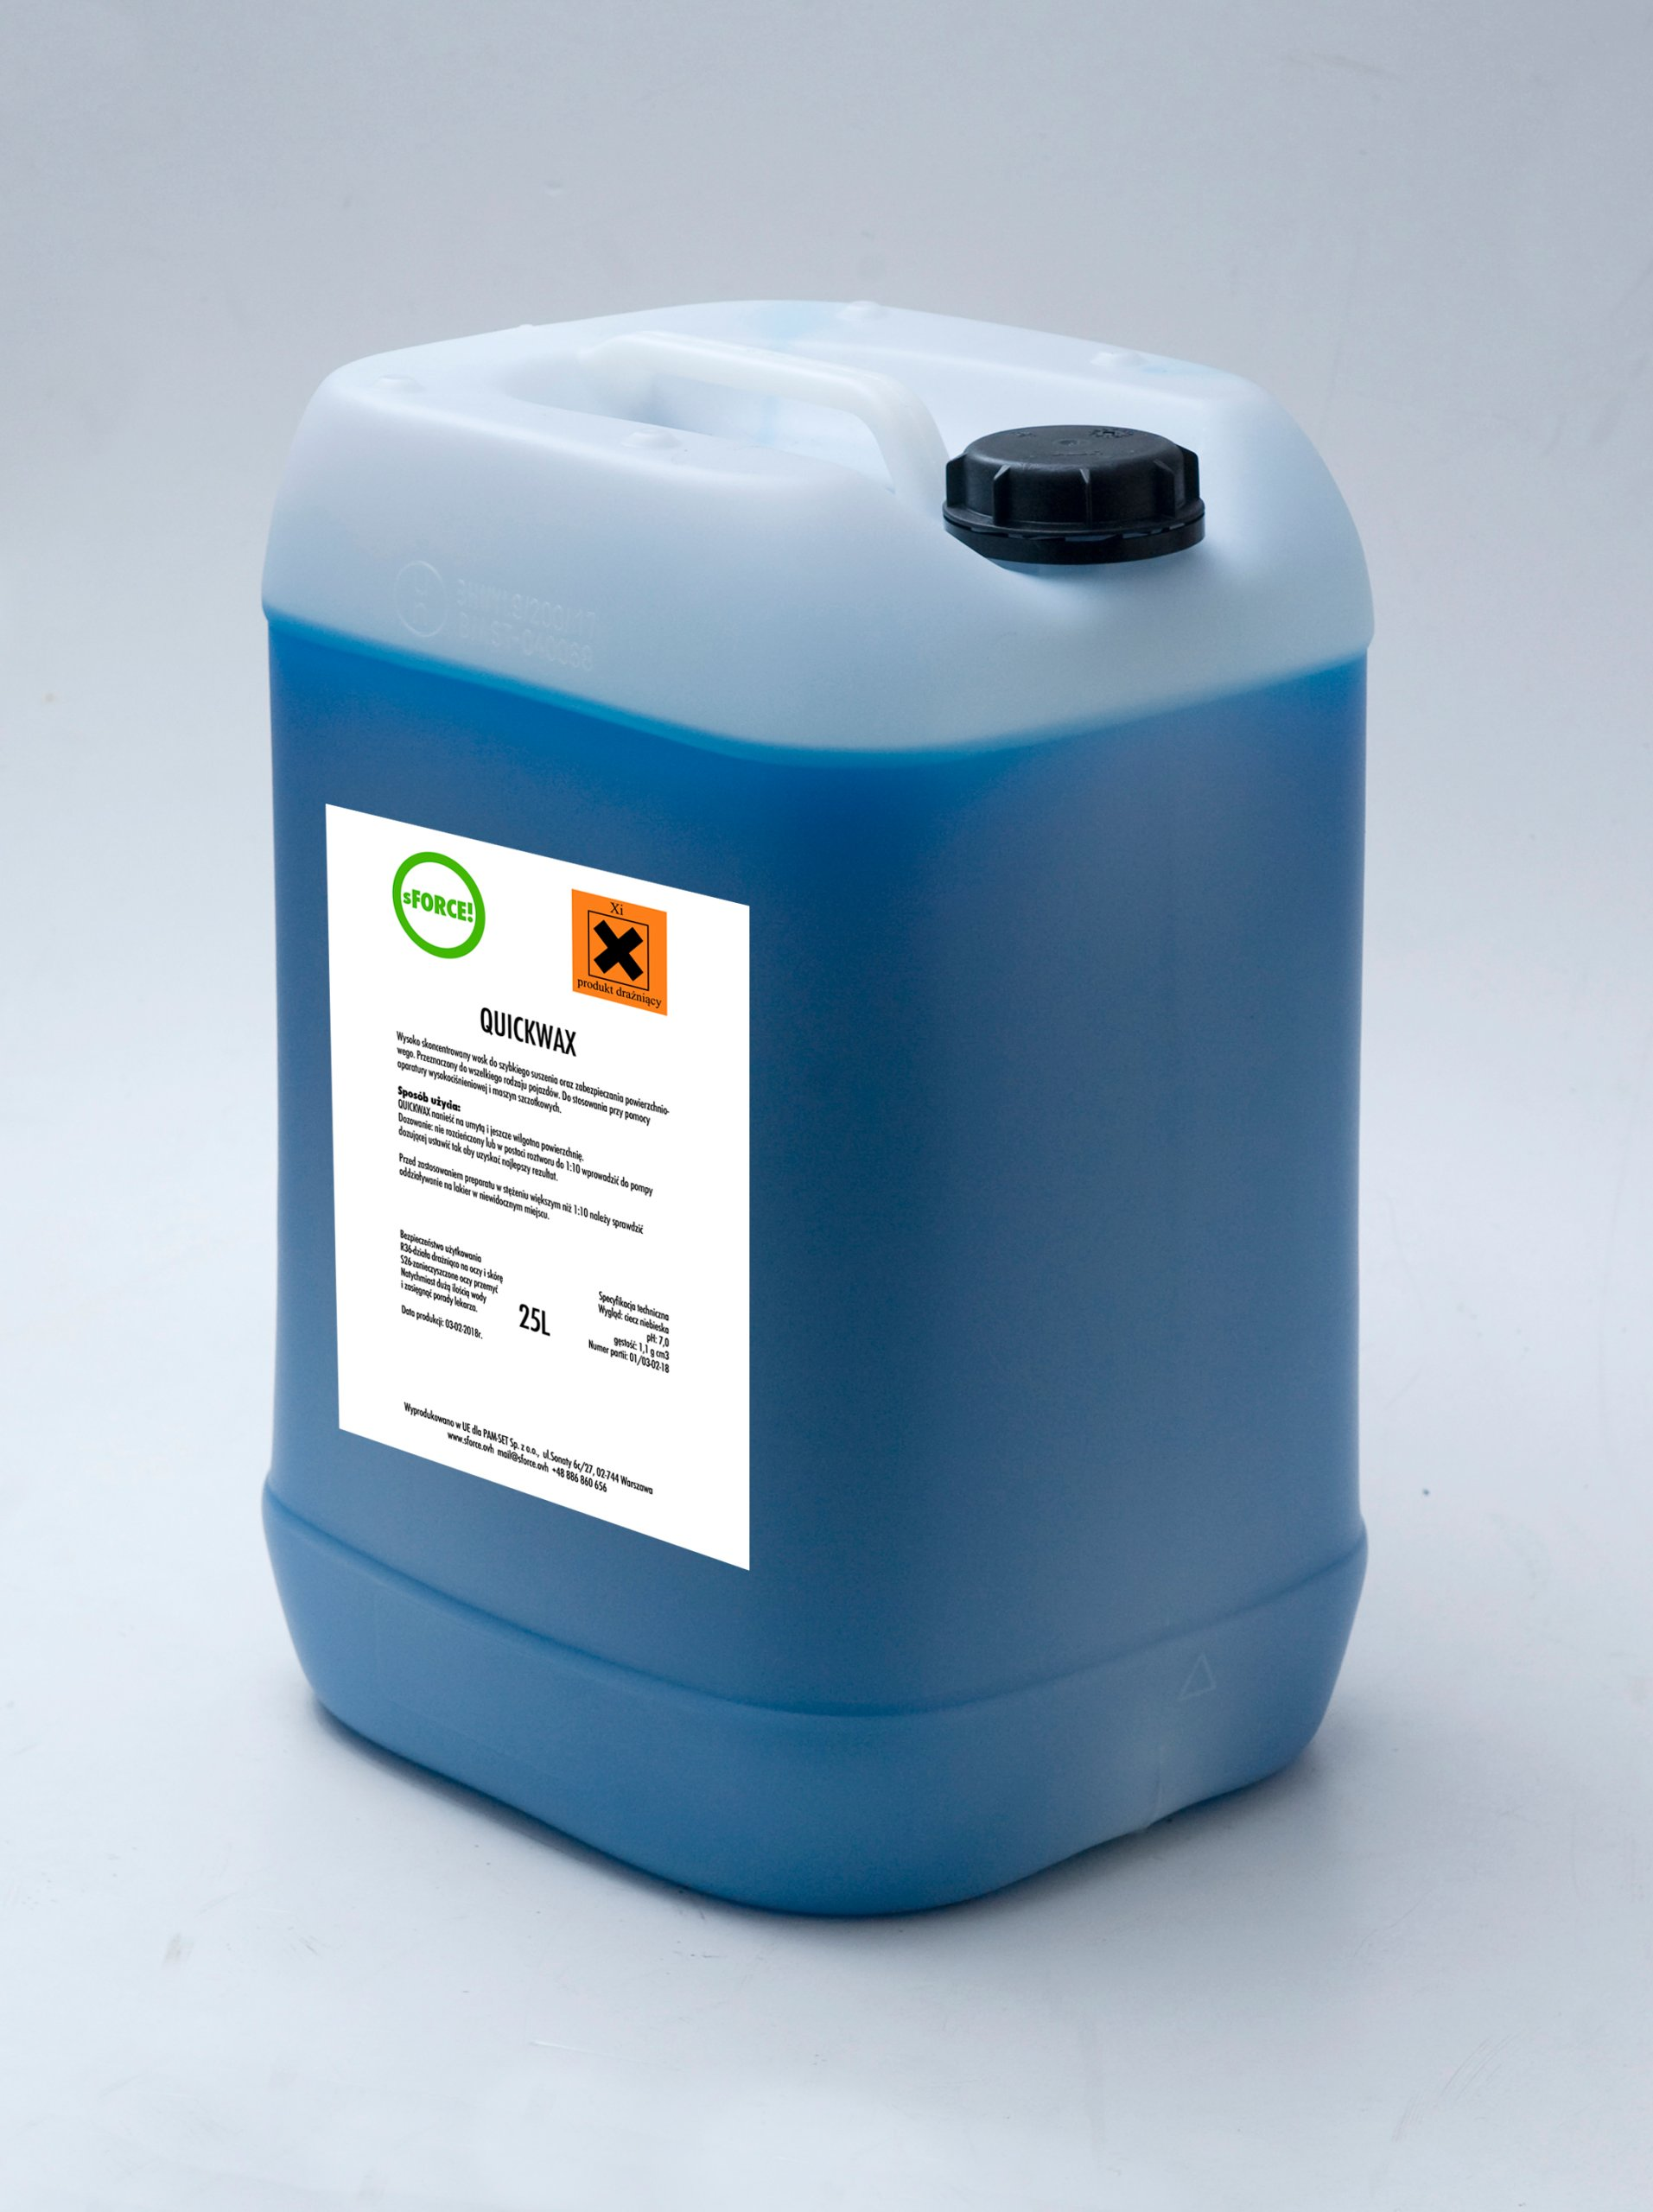 Wosk natryskowy hydrowosk myjnia samoob sForce 25L